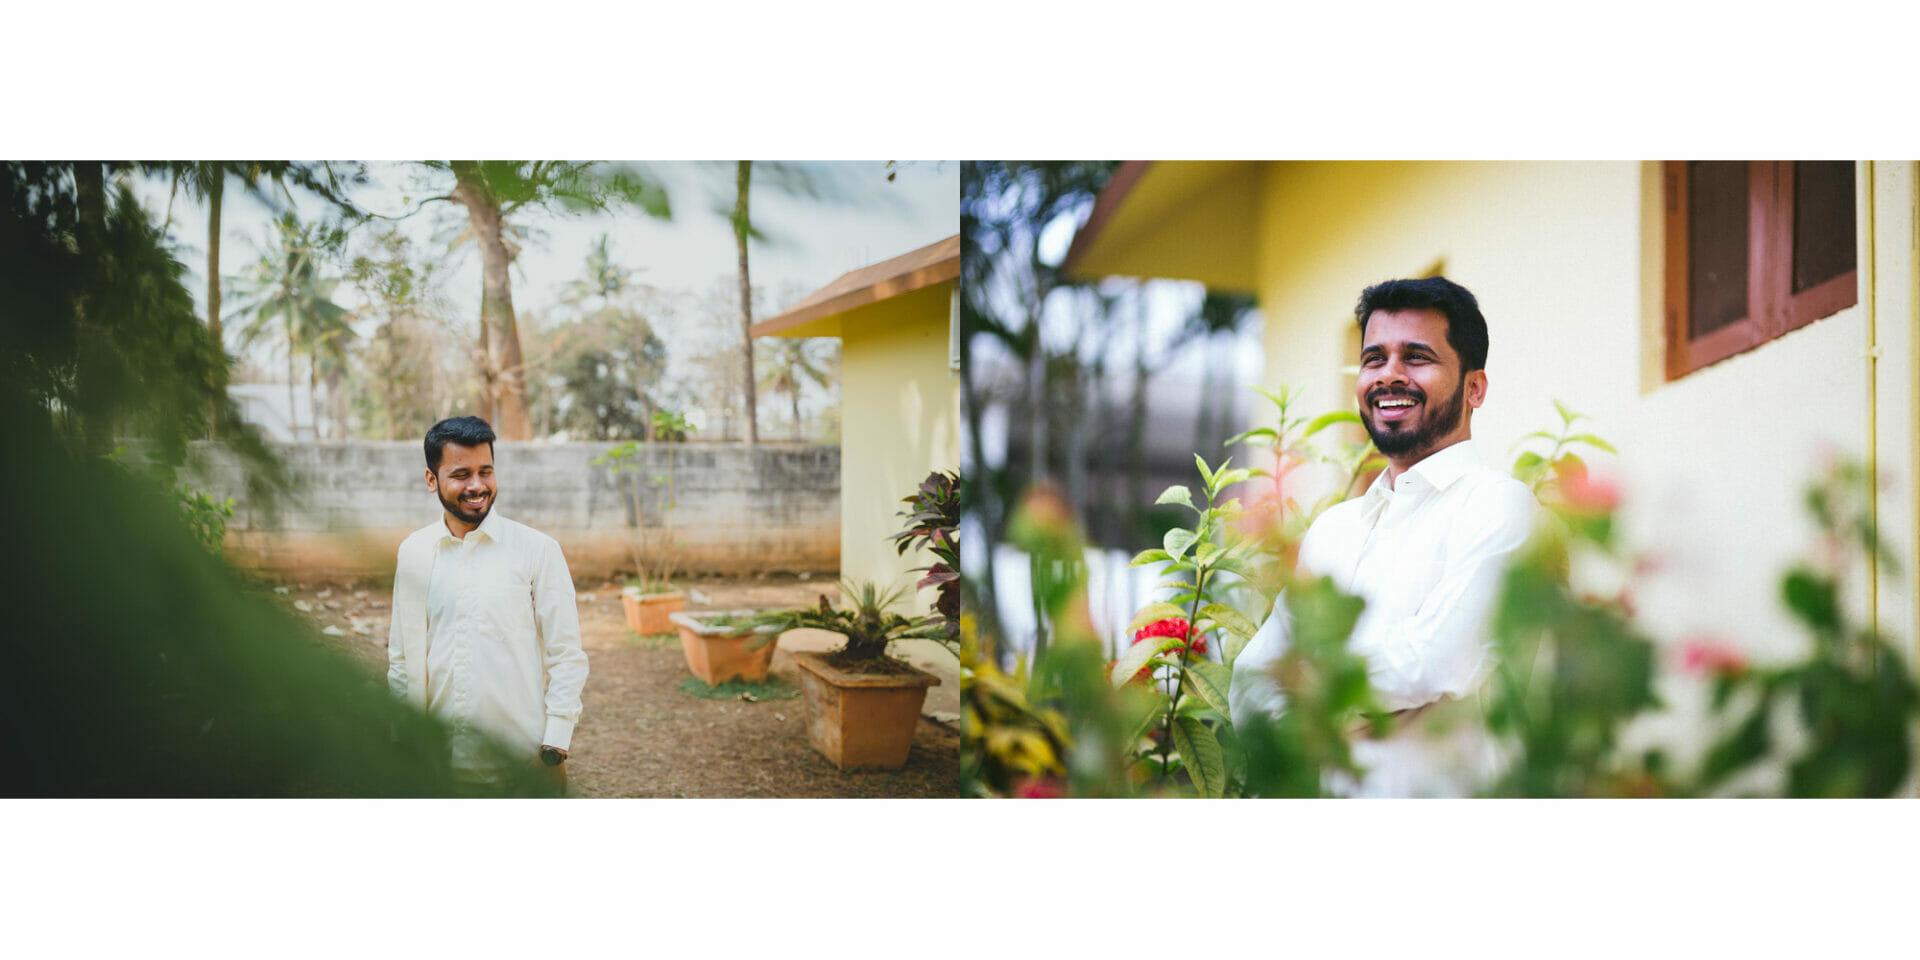 shruti annayya sree vikash photography wedding kalathur gardens 8